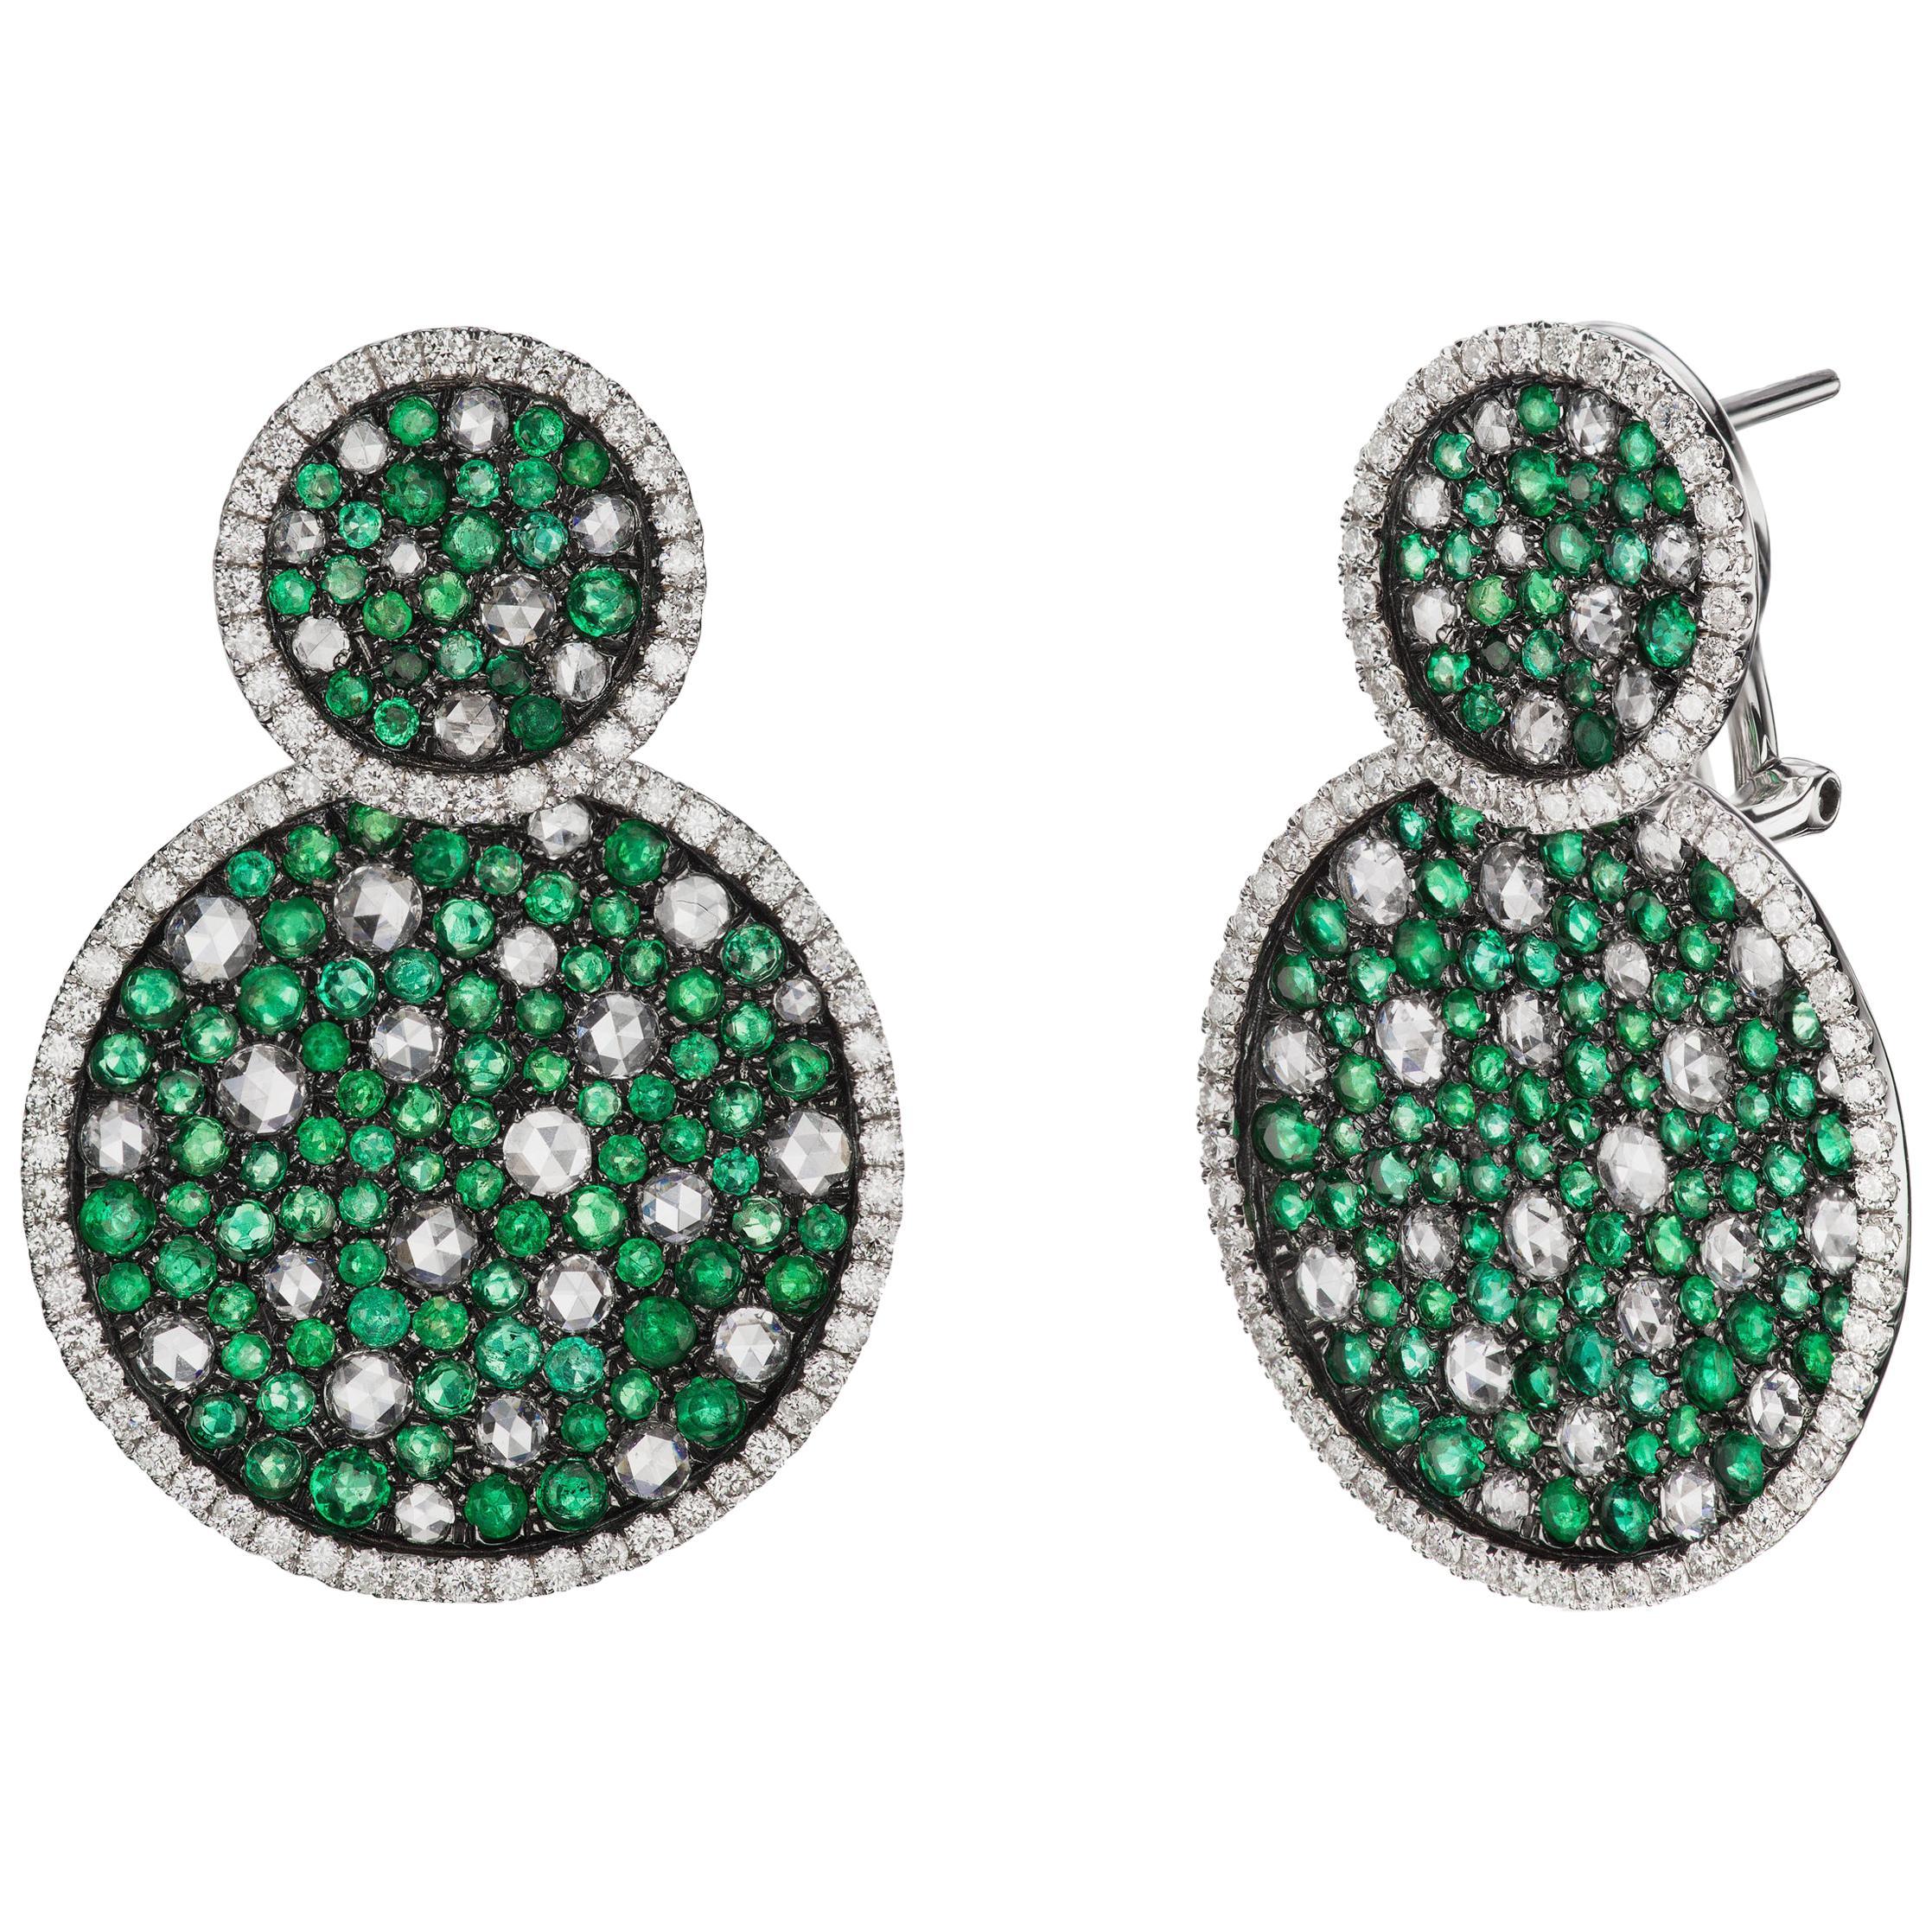 18 Karat White Gold Emeralds and Diamond Cluster Drop Earrings